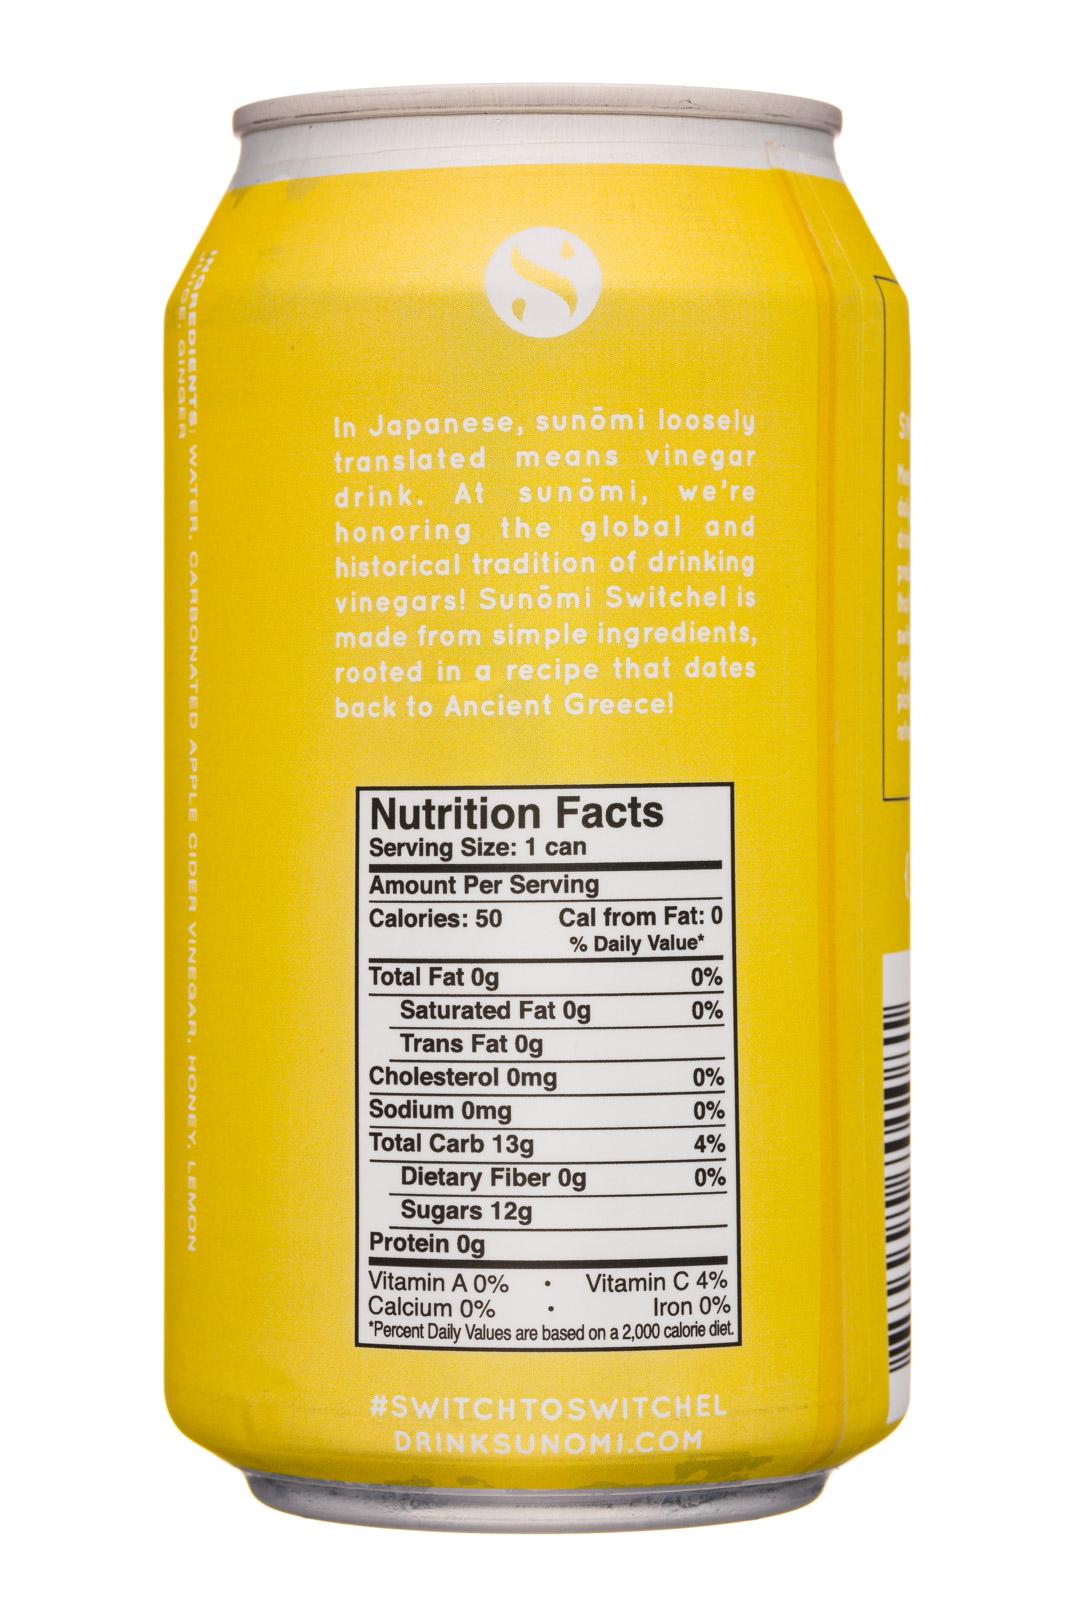 Sunomi: SipCity-12oz-Sunomi-SparklingSwitchel-Lemon-Facts